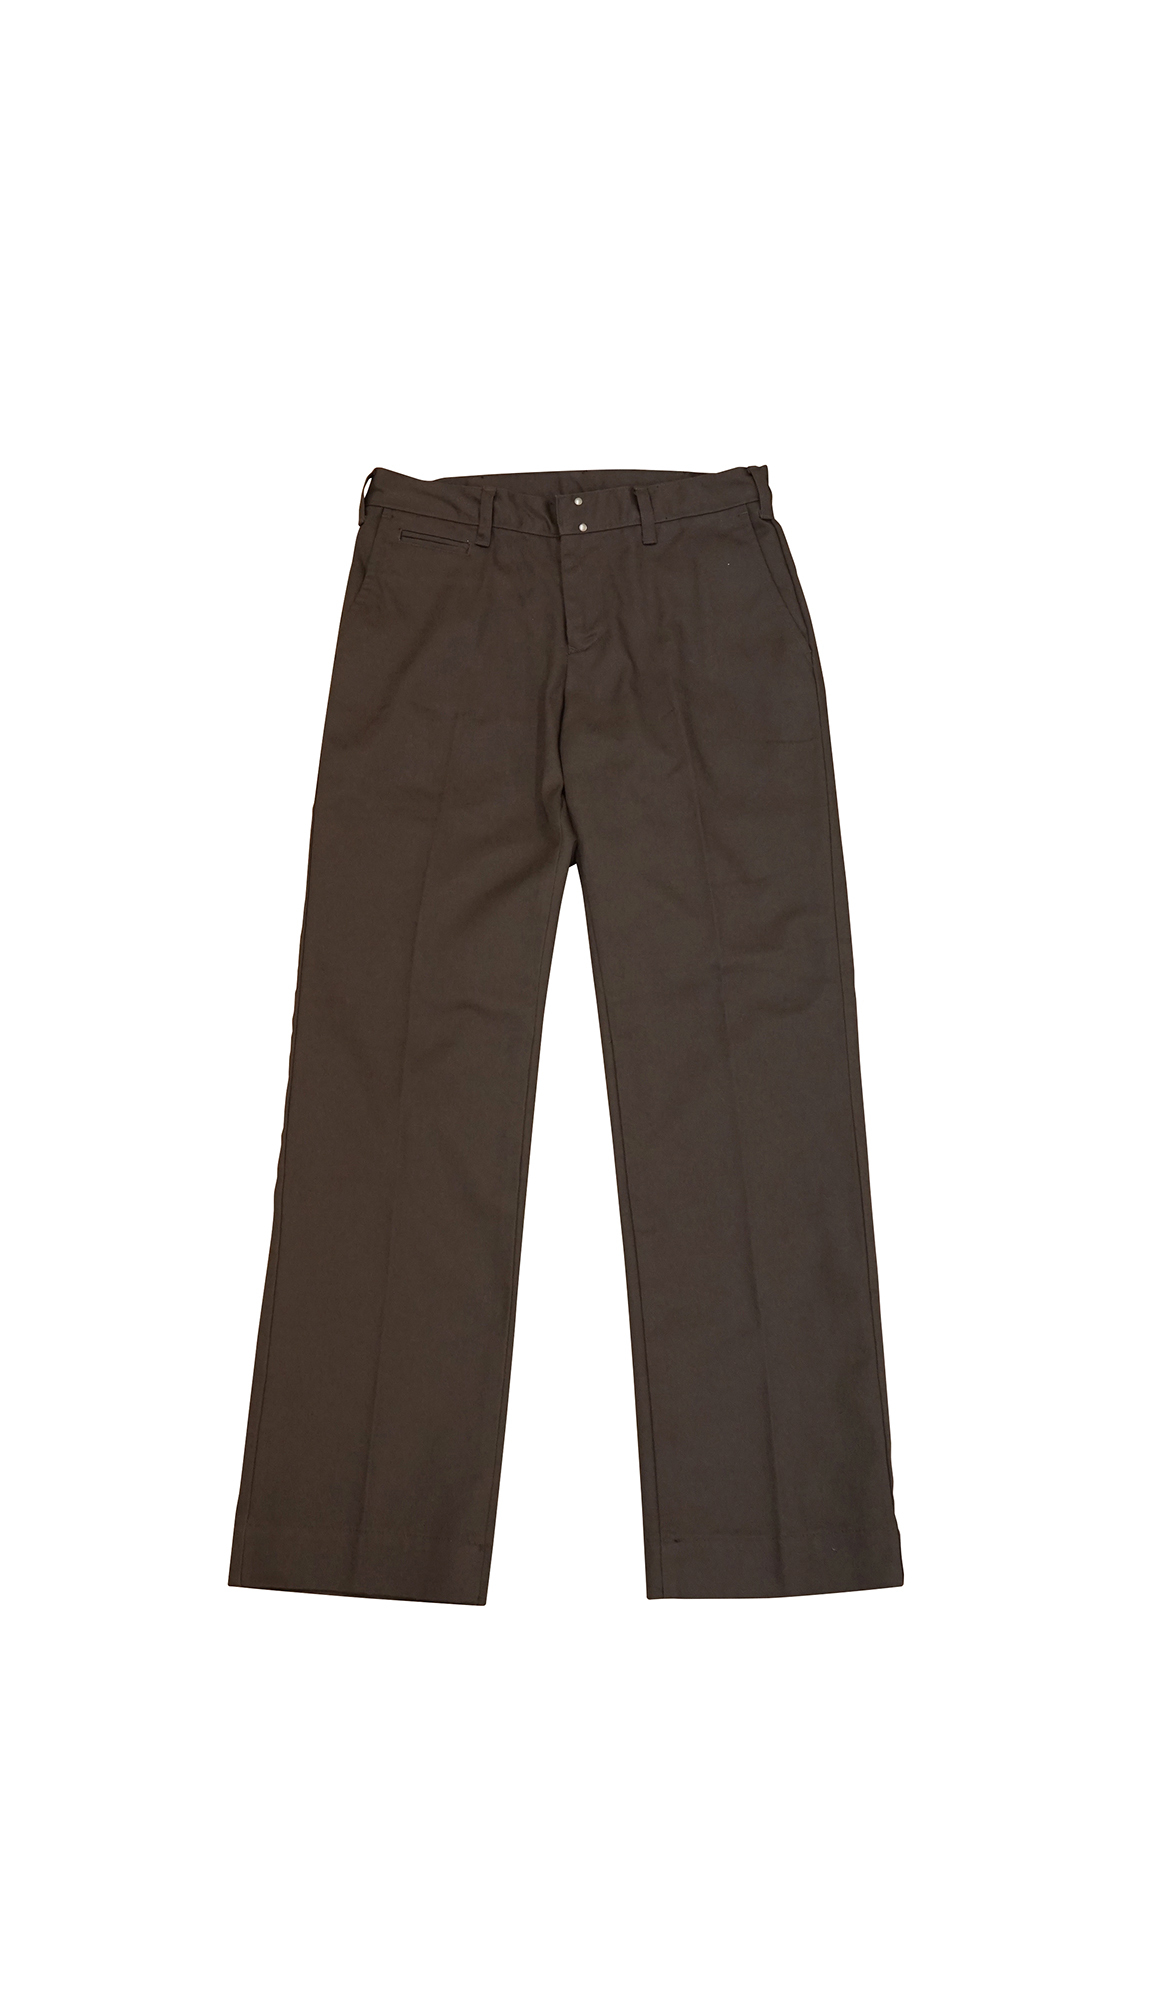 T/C SLACKS PANTS (BROWN)